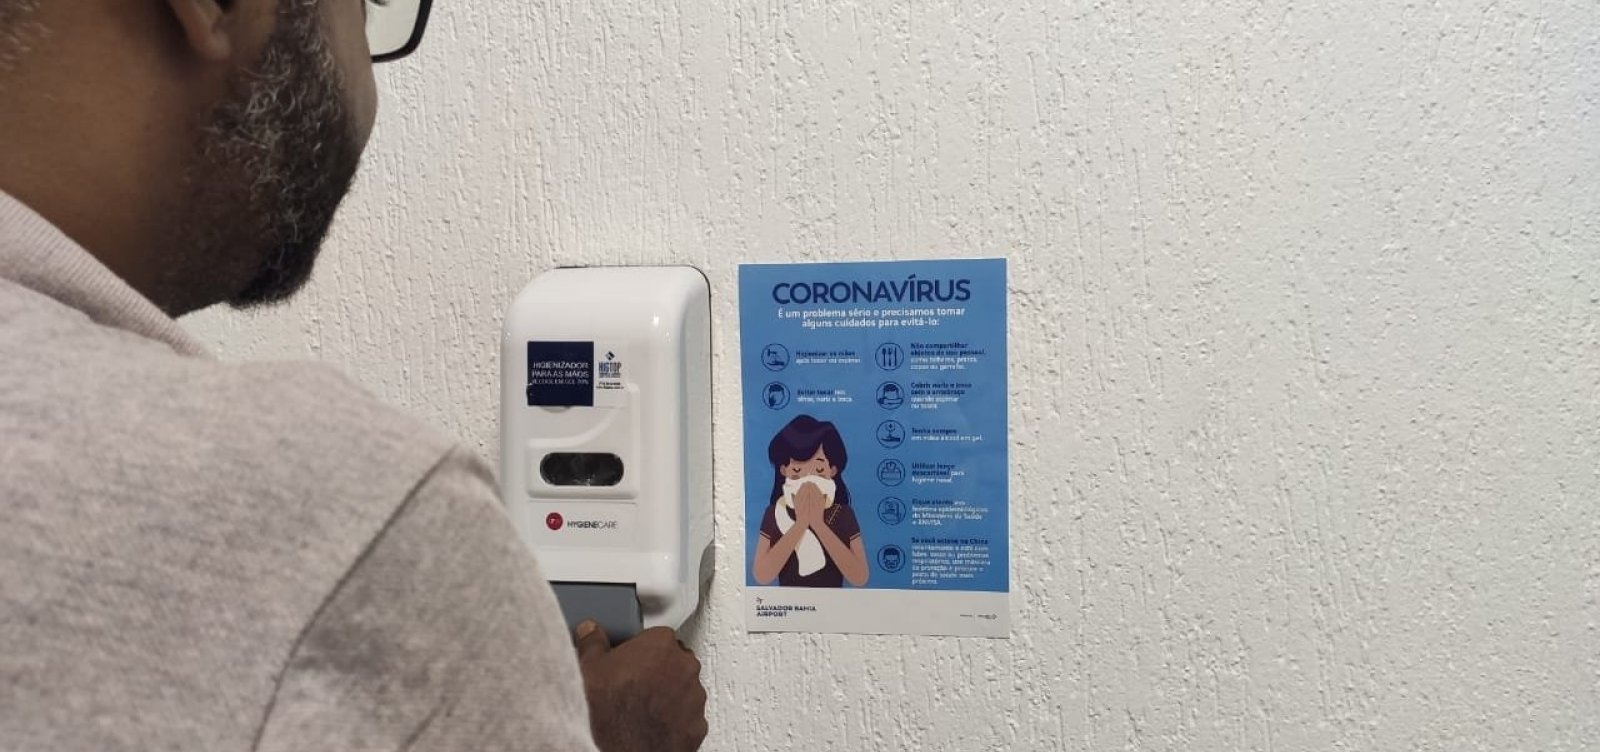 [Aeroporto de Salvador e Anvisa apresentam plano de contingência ao coronavírus]